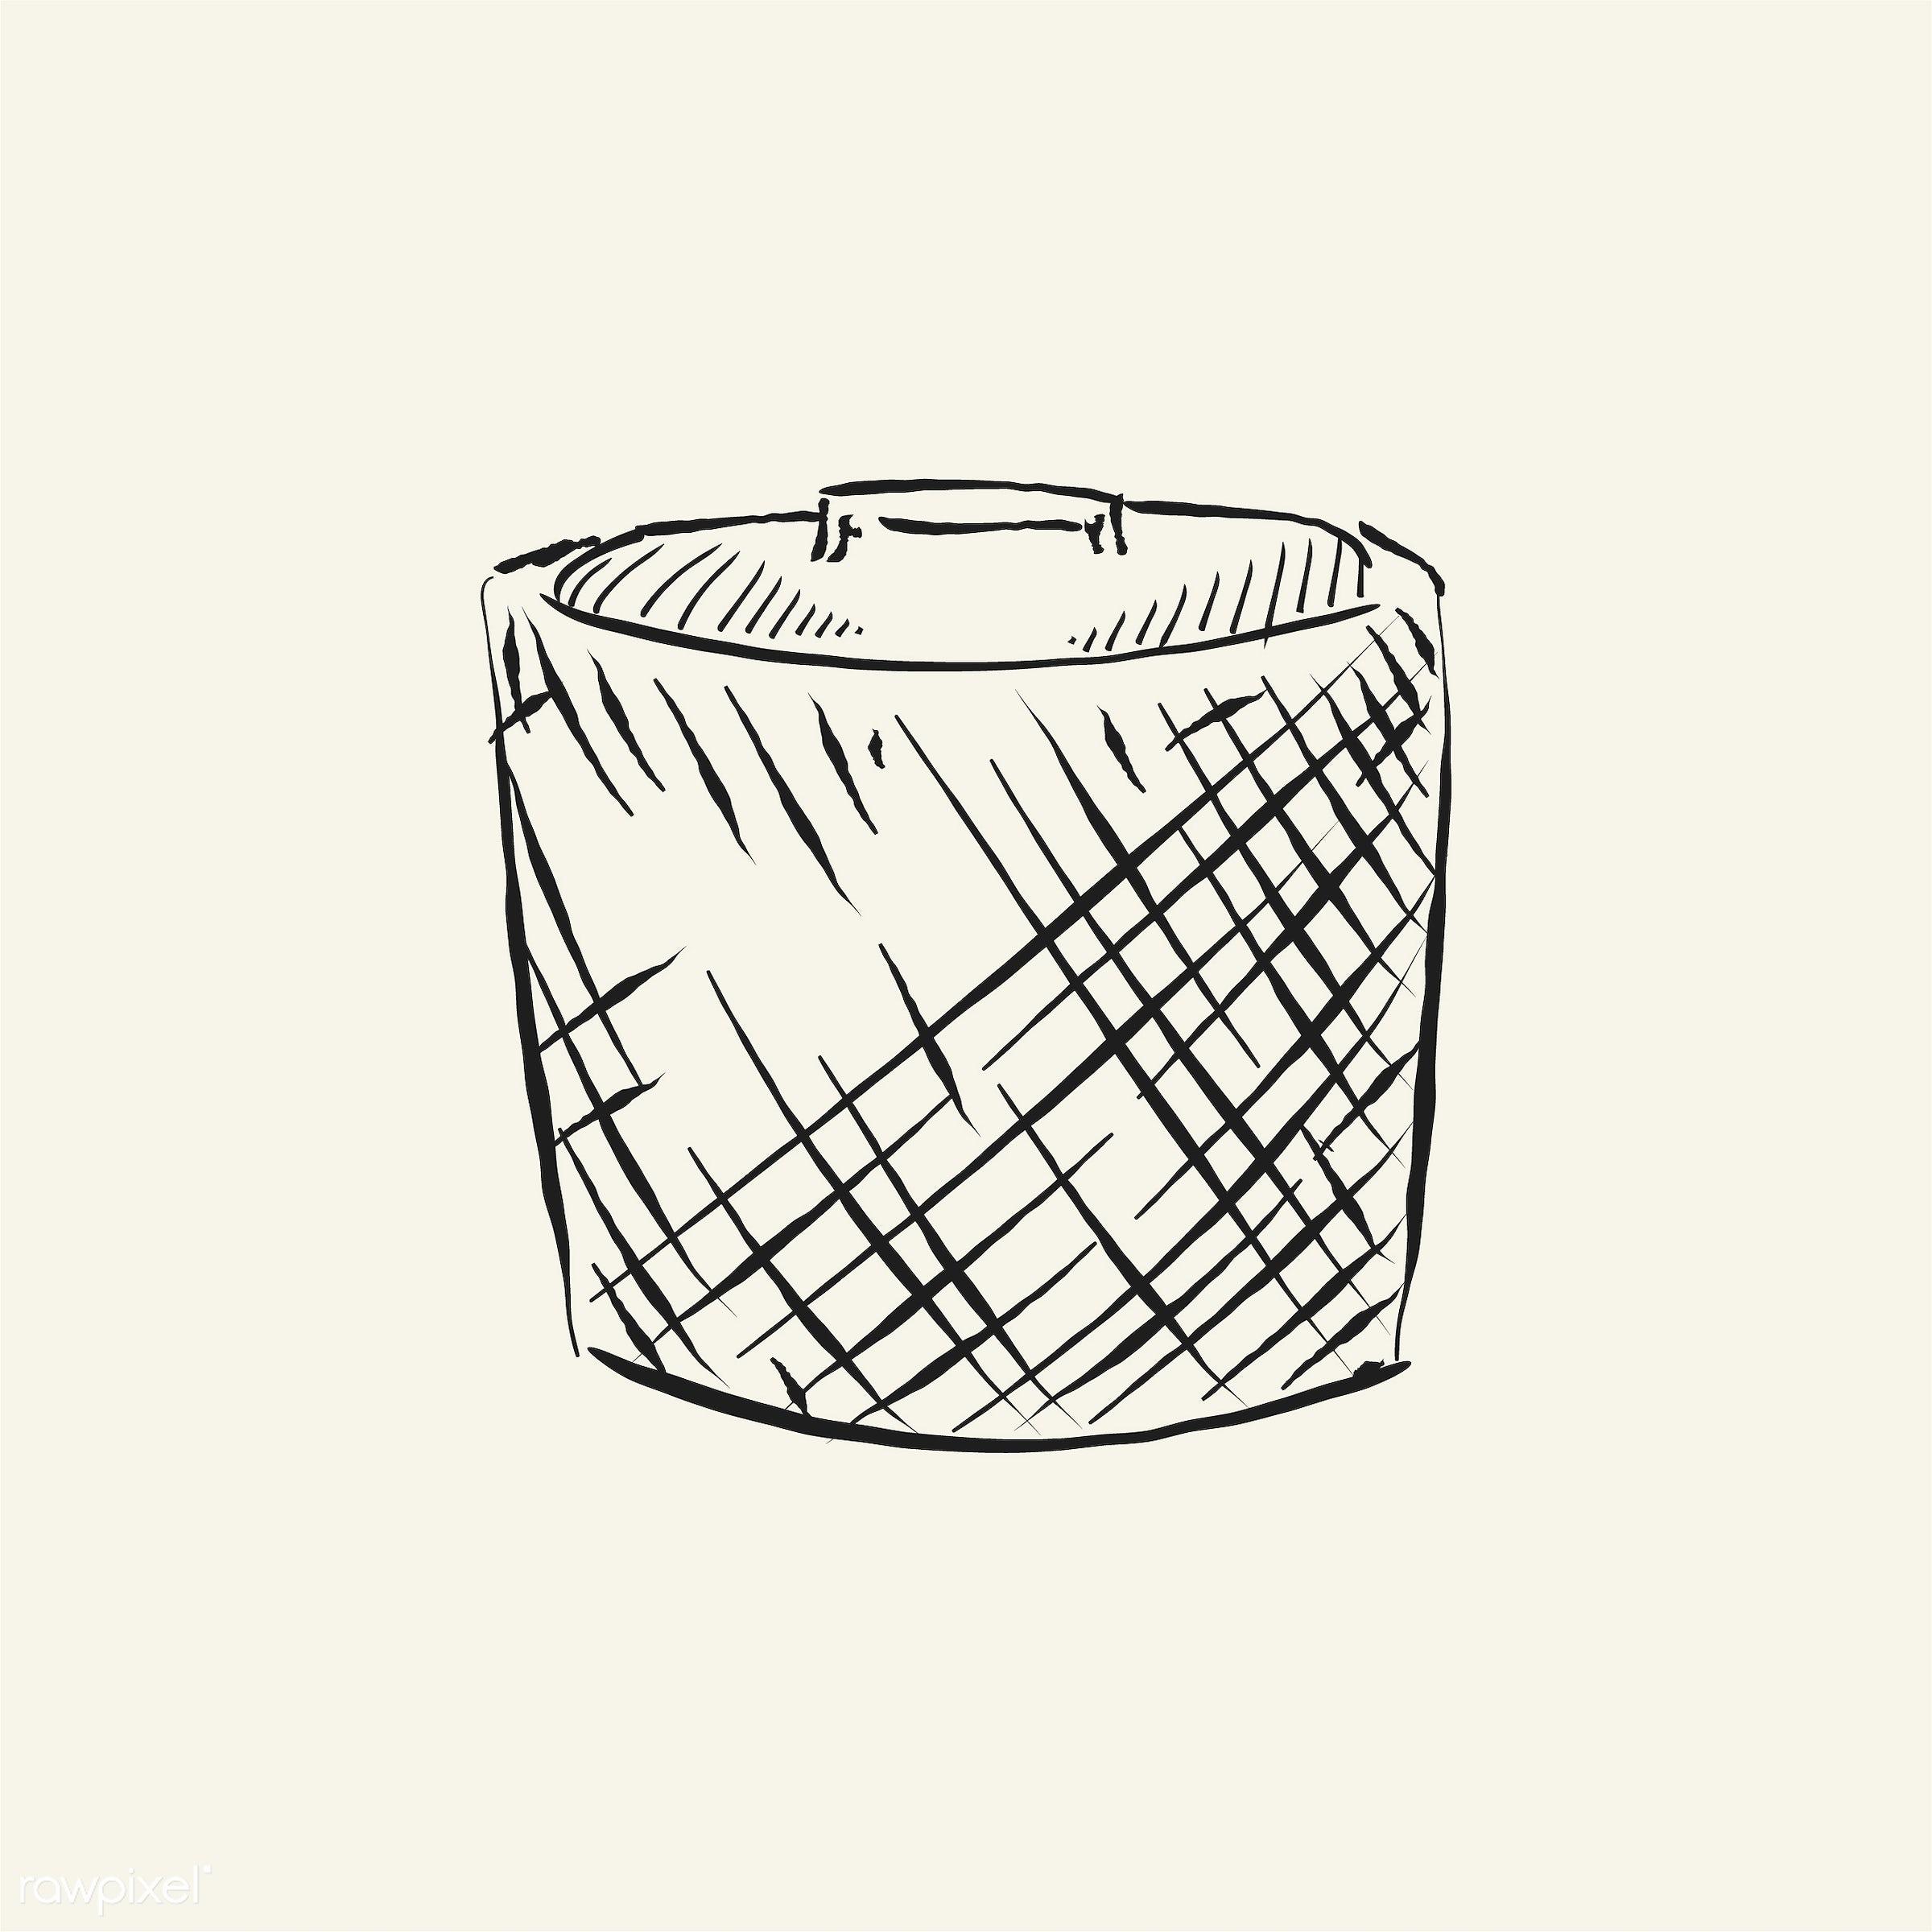 Vintage illustration of a basket - antique, black, design, drawing, equipment, fisherman, fishing, fishnet, graphic, hand...